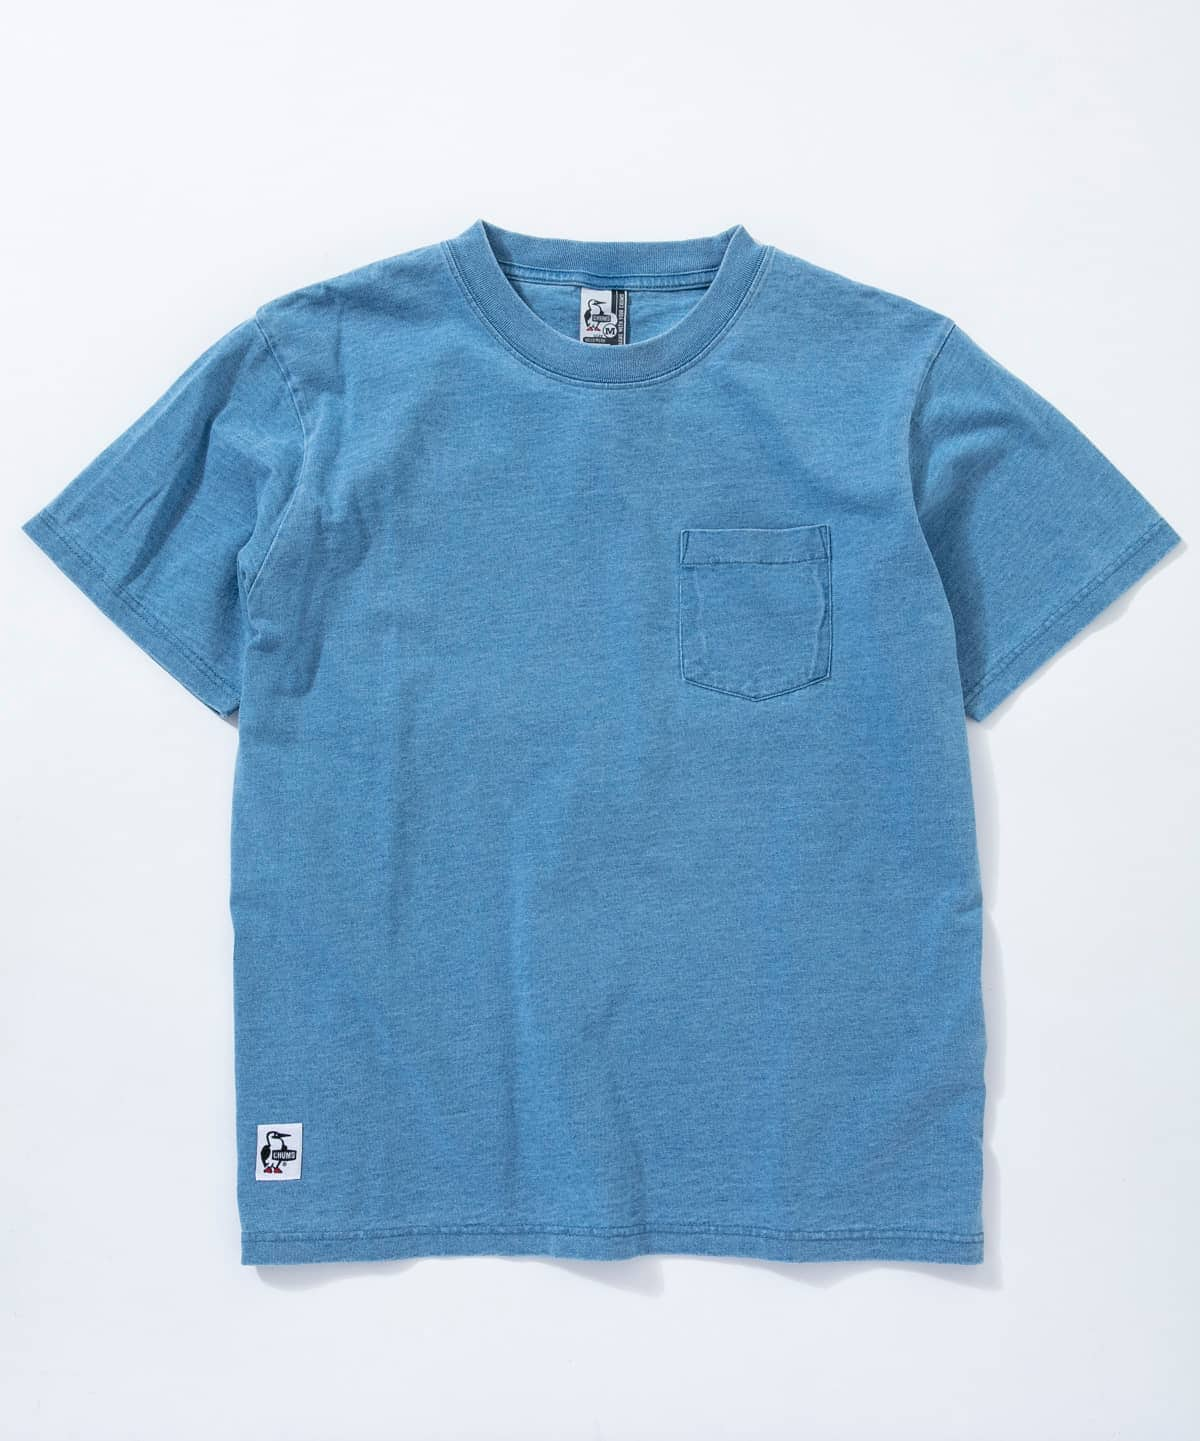 https://www.chums.jp/shop/g/gCH01-1486-N035-04/